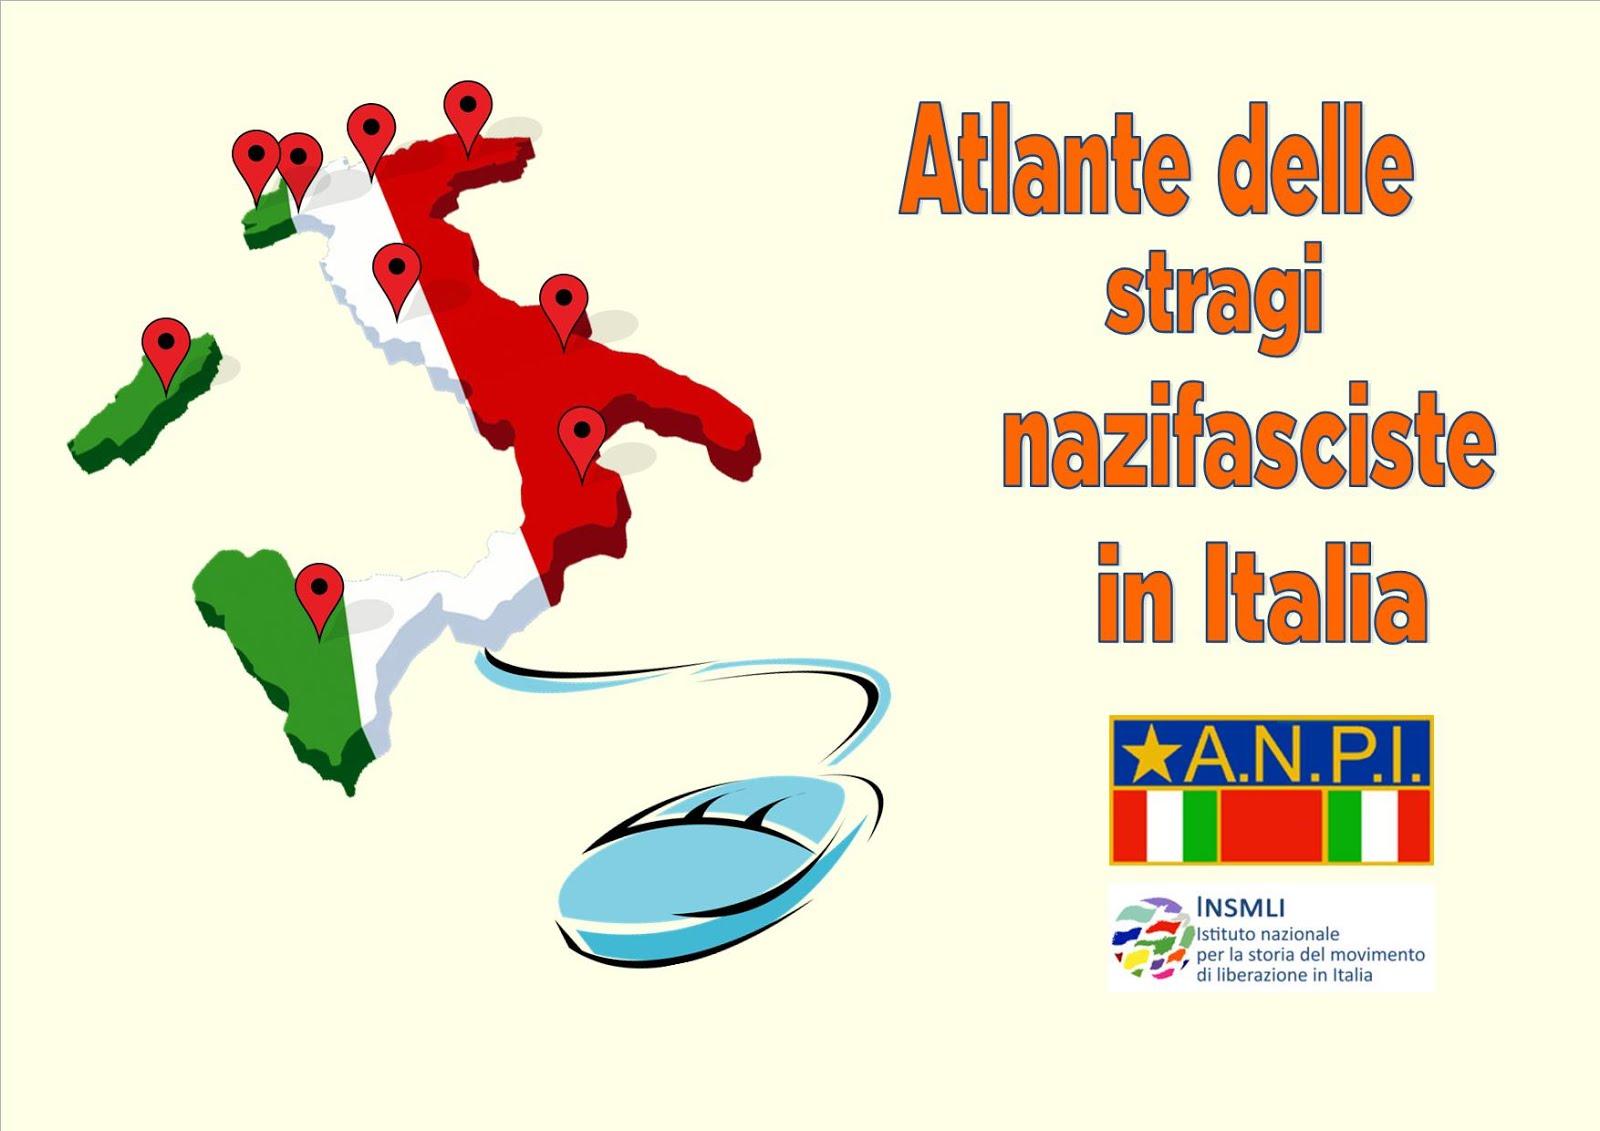 ATLANTE DELLE STRAGI NAZIFASCISTE